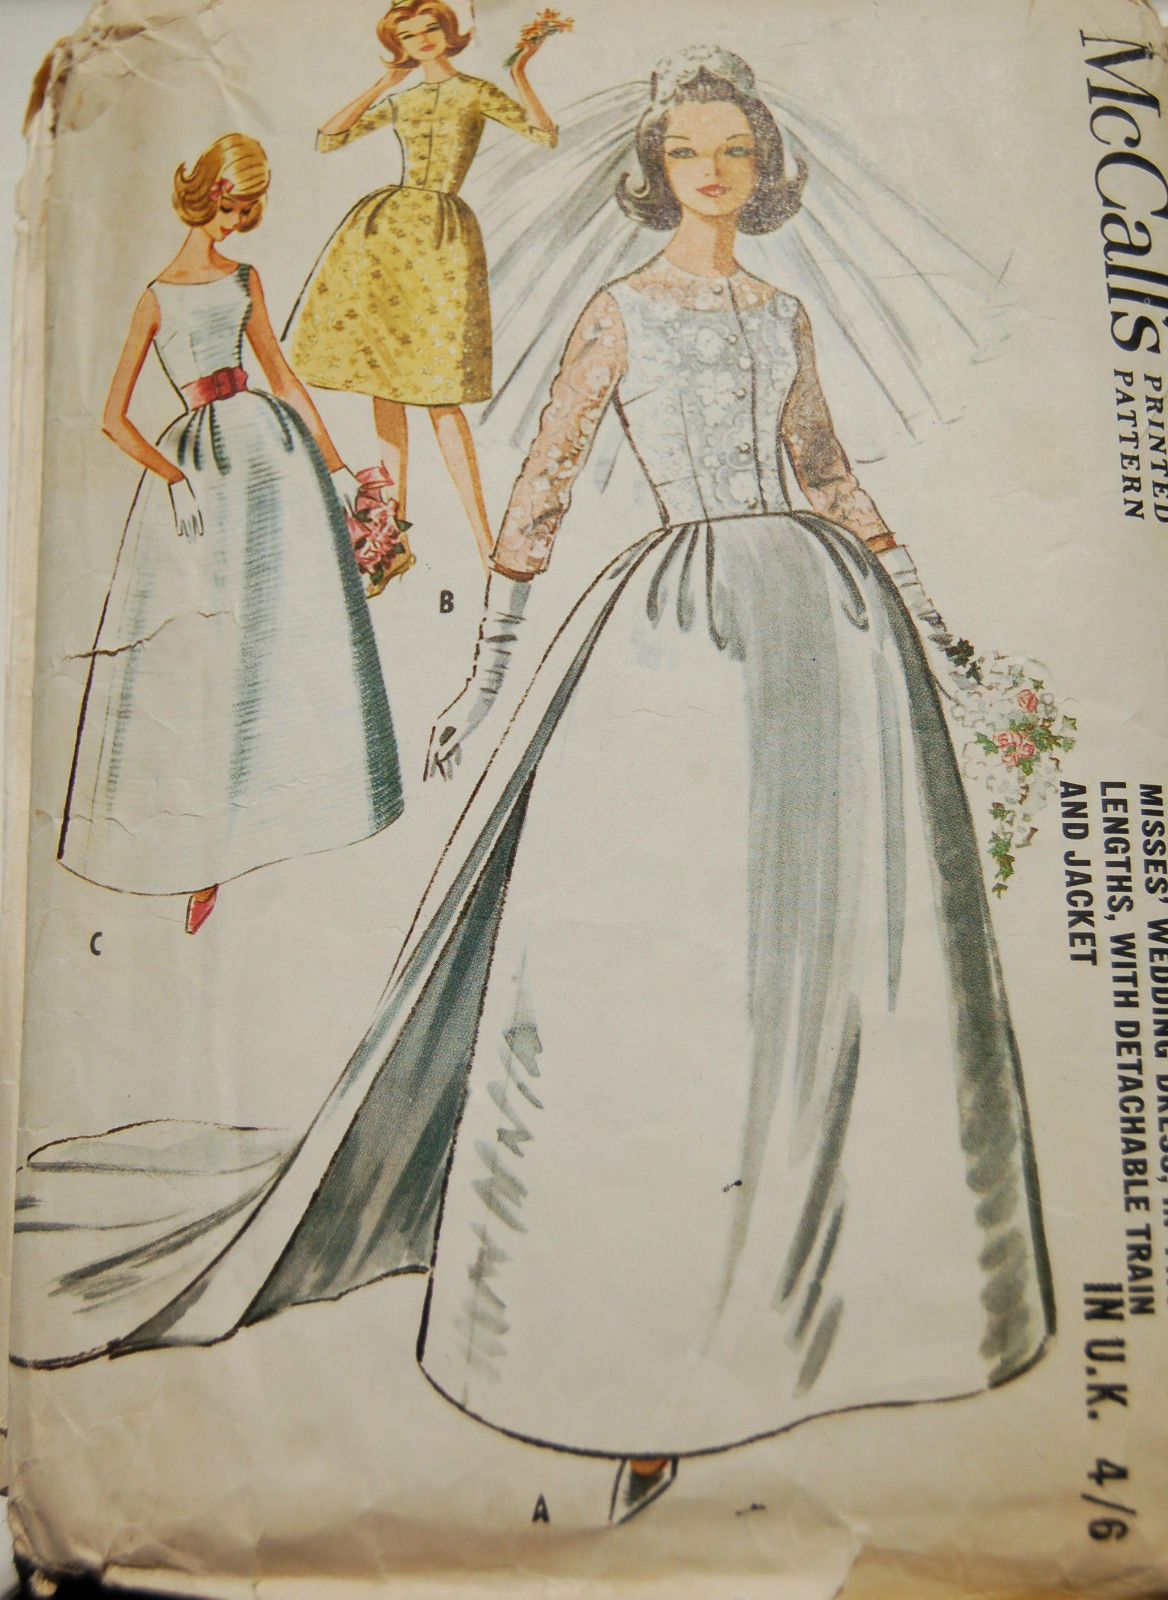 Vintage 1960s Sewing PatternWedding Dress & Detachable